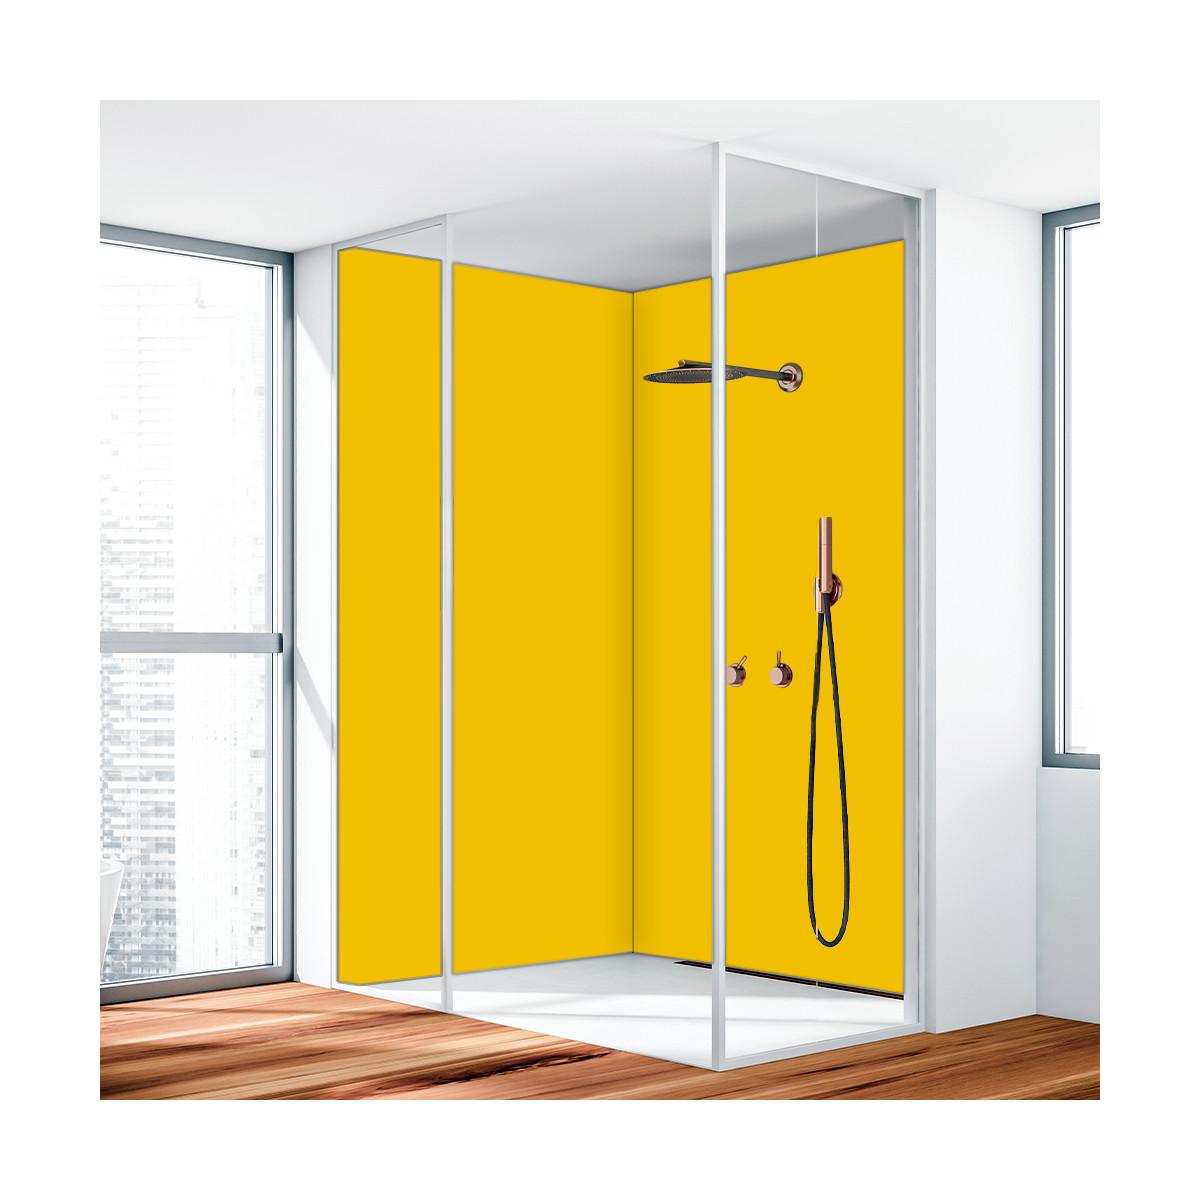 duschr ckwand aluverbund gelb 1023 119 90. Black Bedroom Furniture Sets. Home Design Ideas